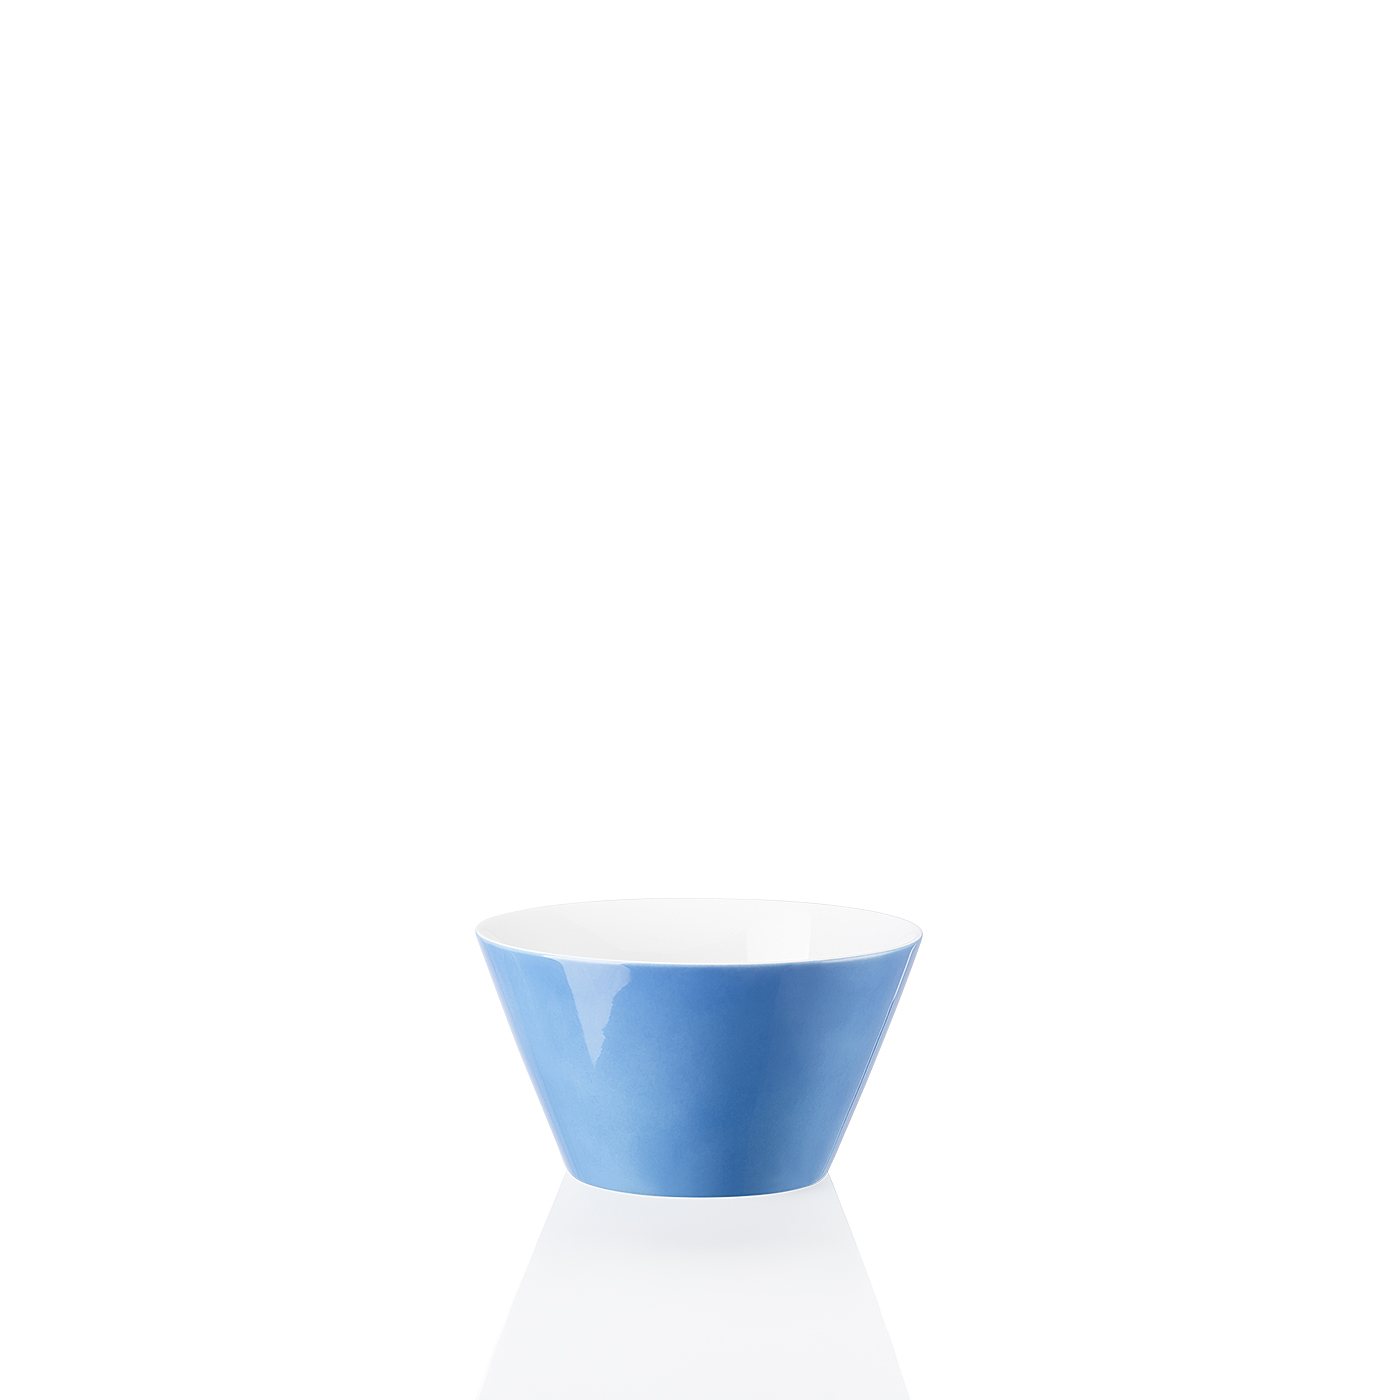 Schale 12 cm Tric Blau Arzberg